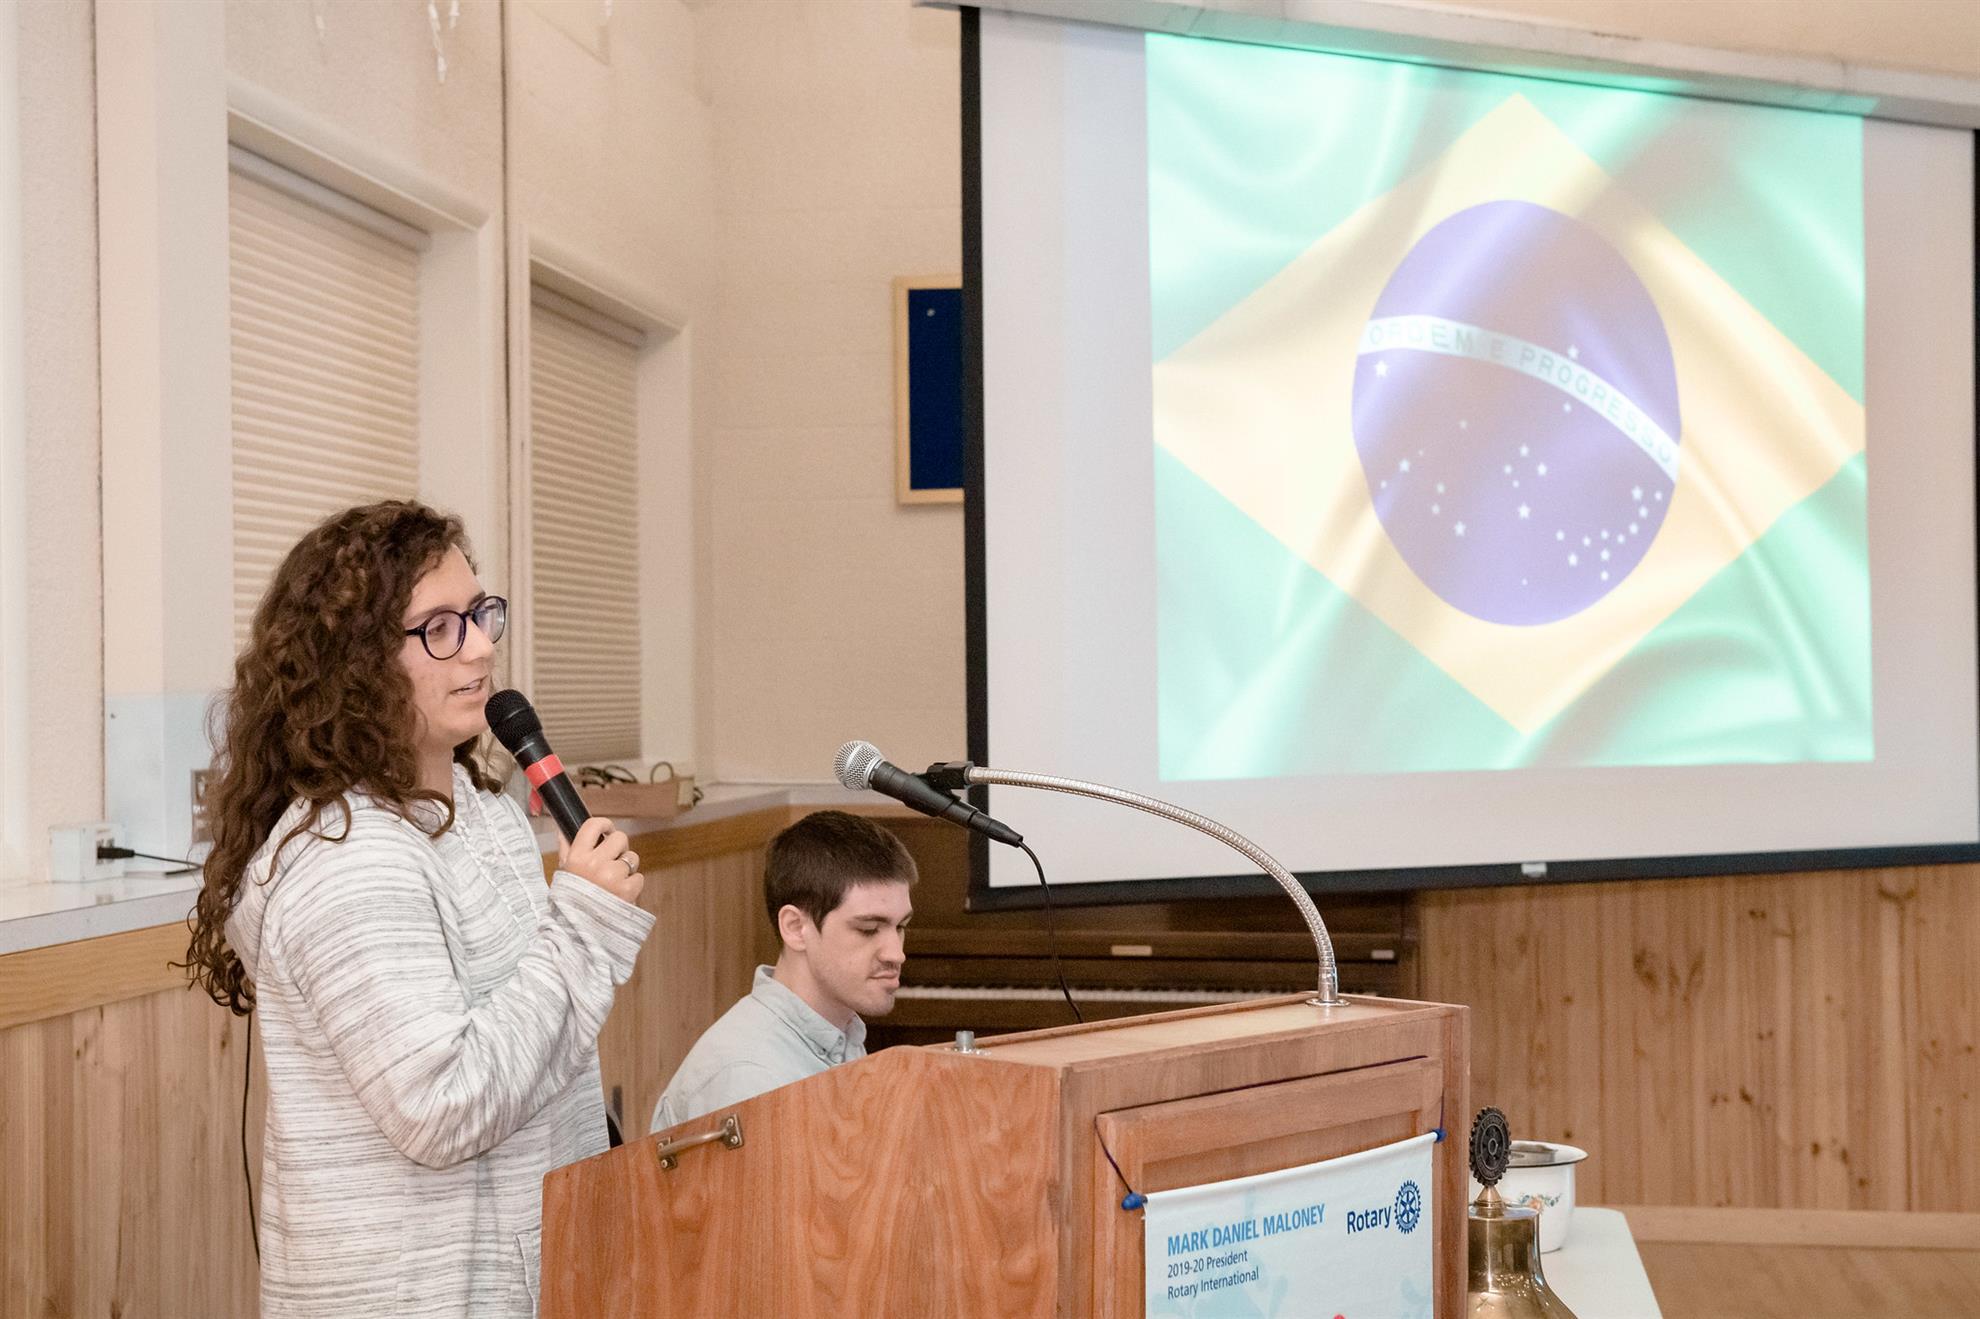 Duda talks about Brazil